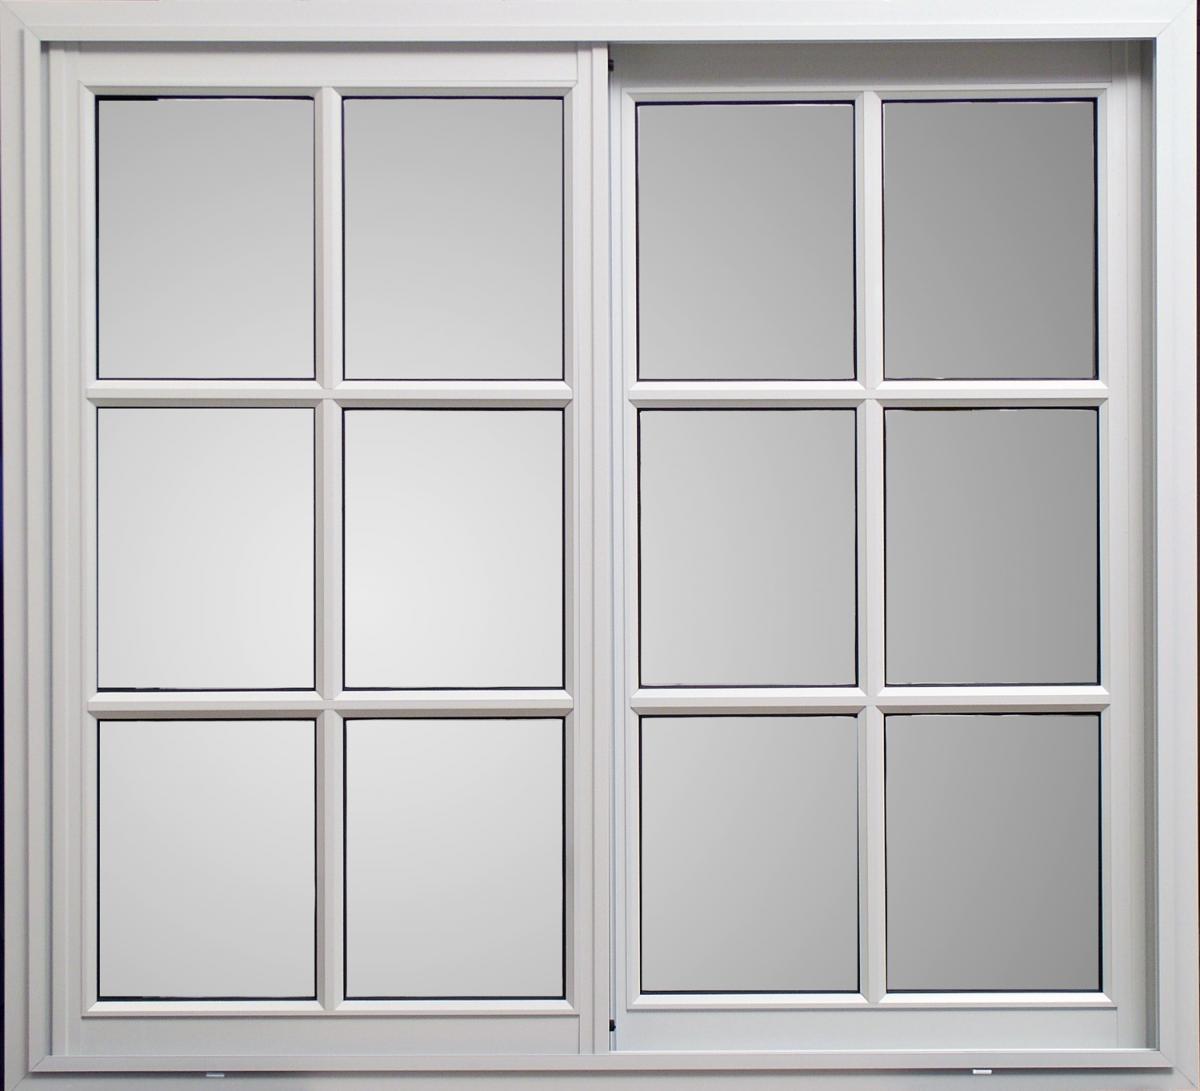 Ventana clasic vidrio repartido sin guia x for Aberturas de pvc en cordoba capital